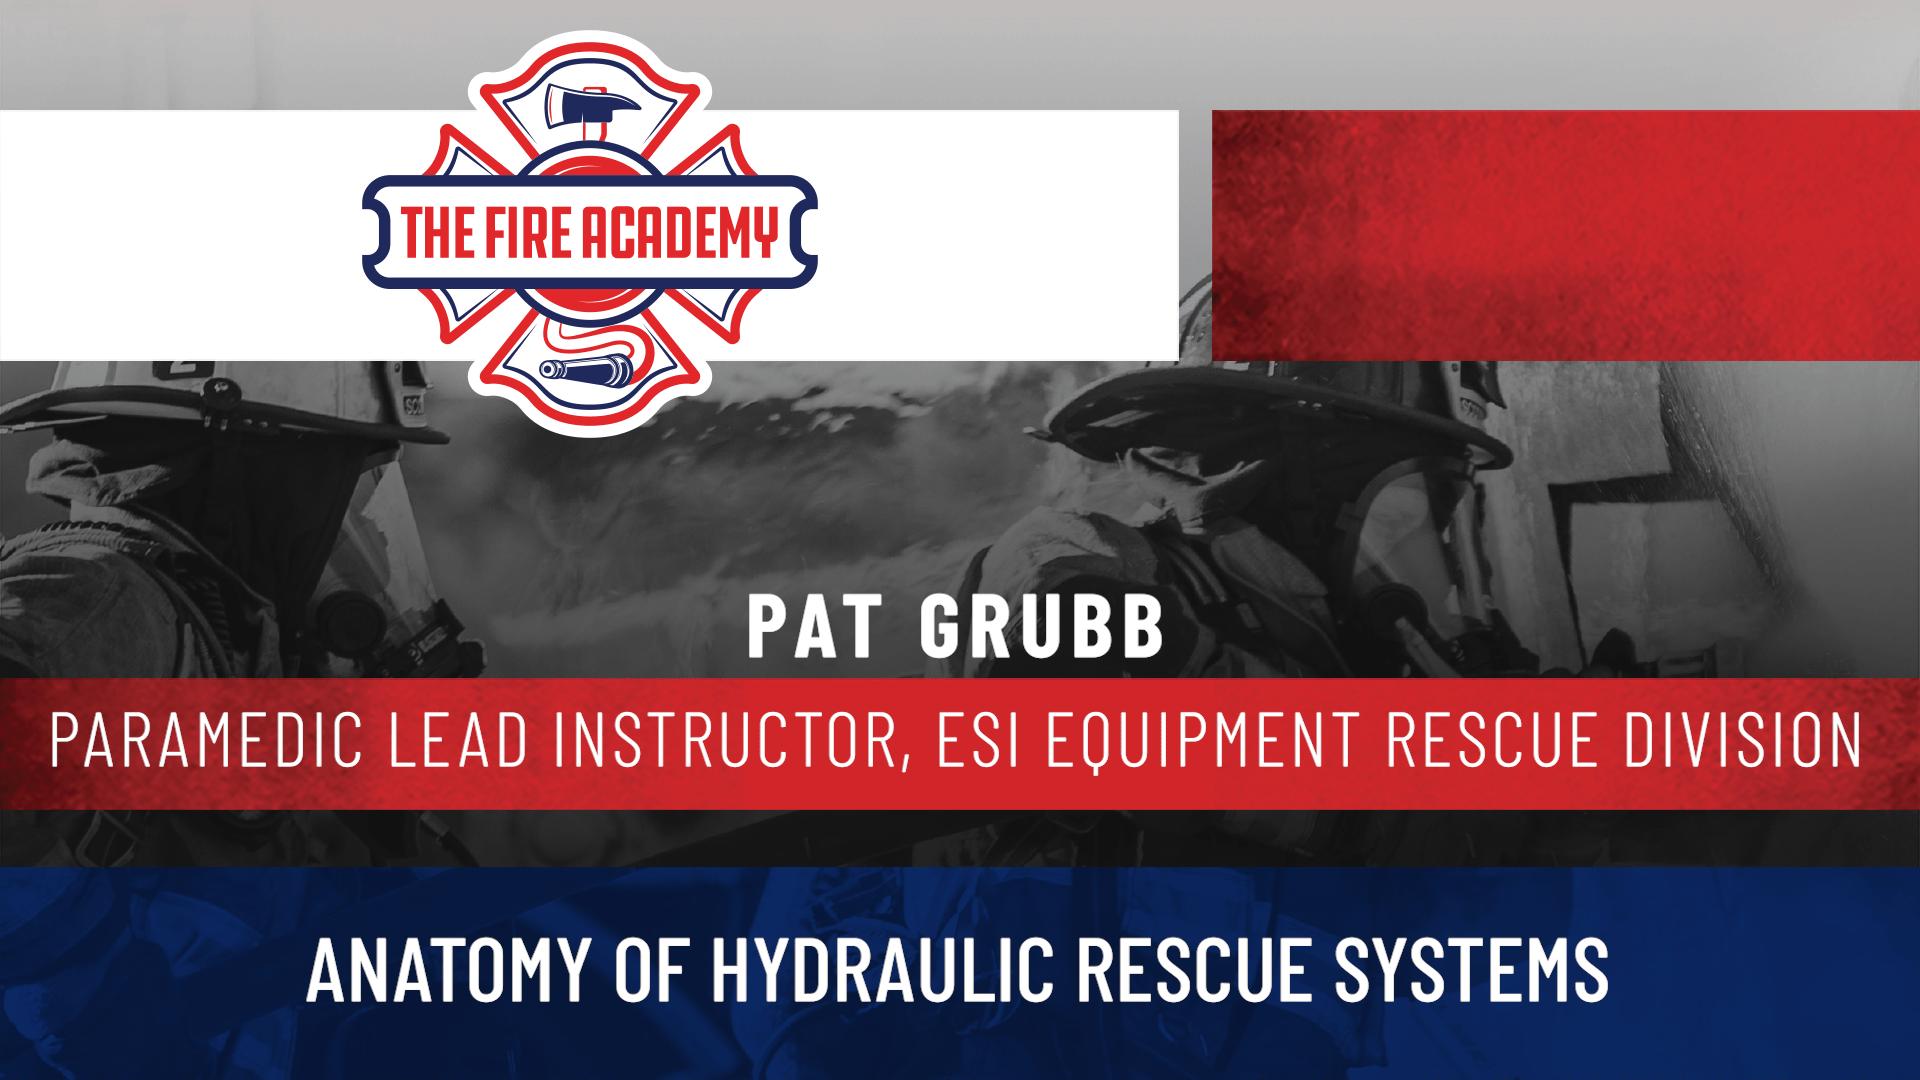 Anatomy of Hydraulic Rescue Systems